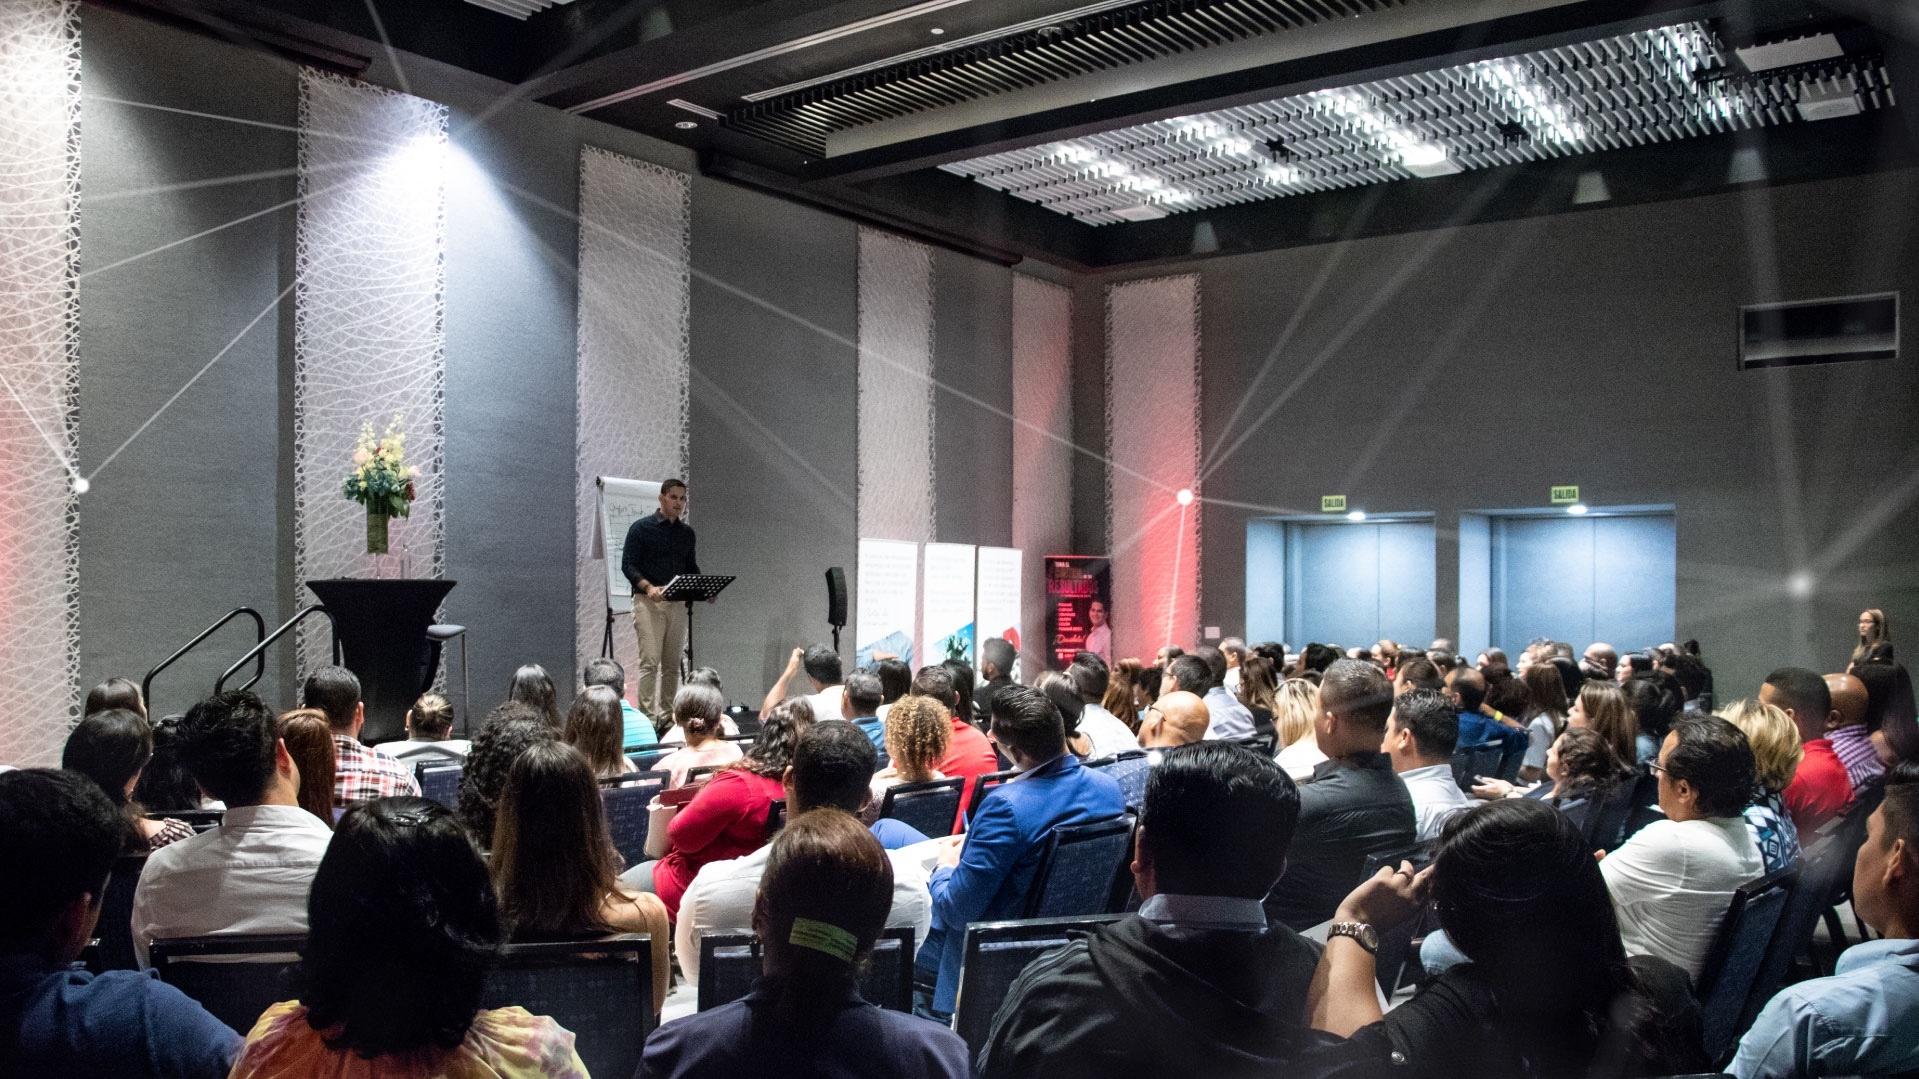 Bolivar mendieta speaker orador autor coach empresario inversionista negocios corporativo